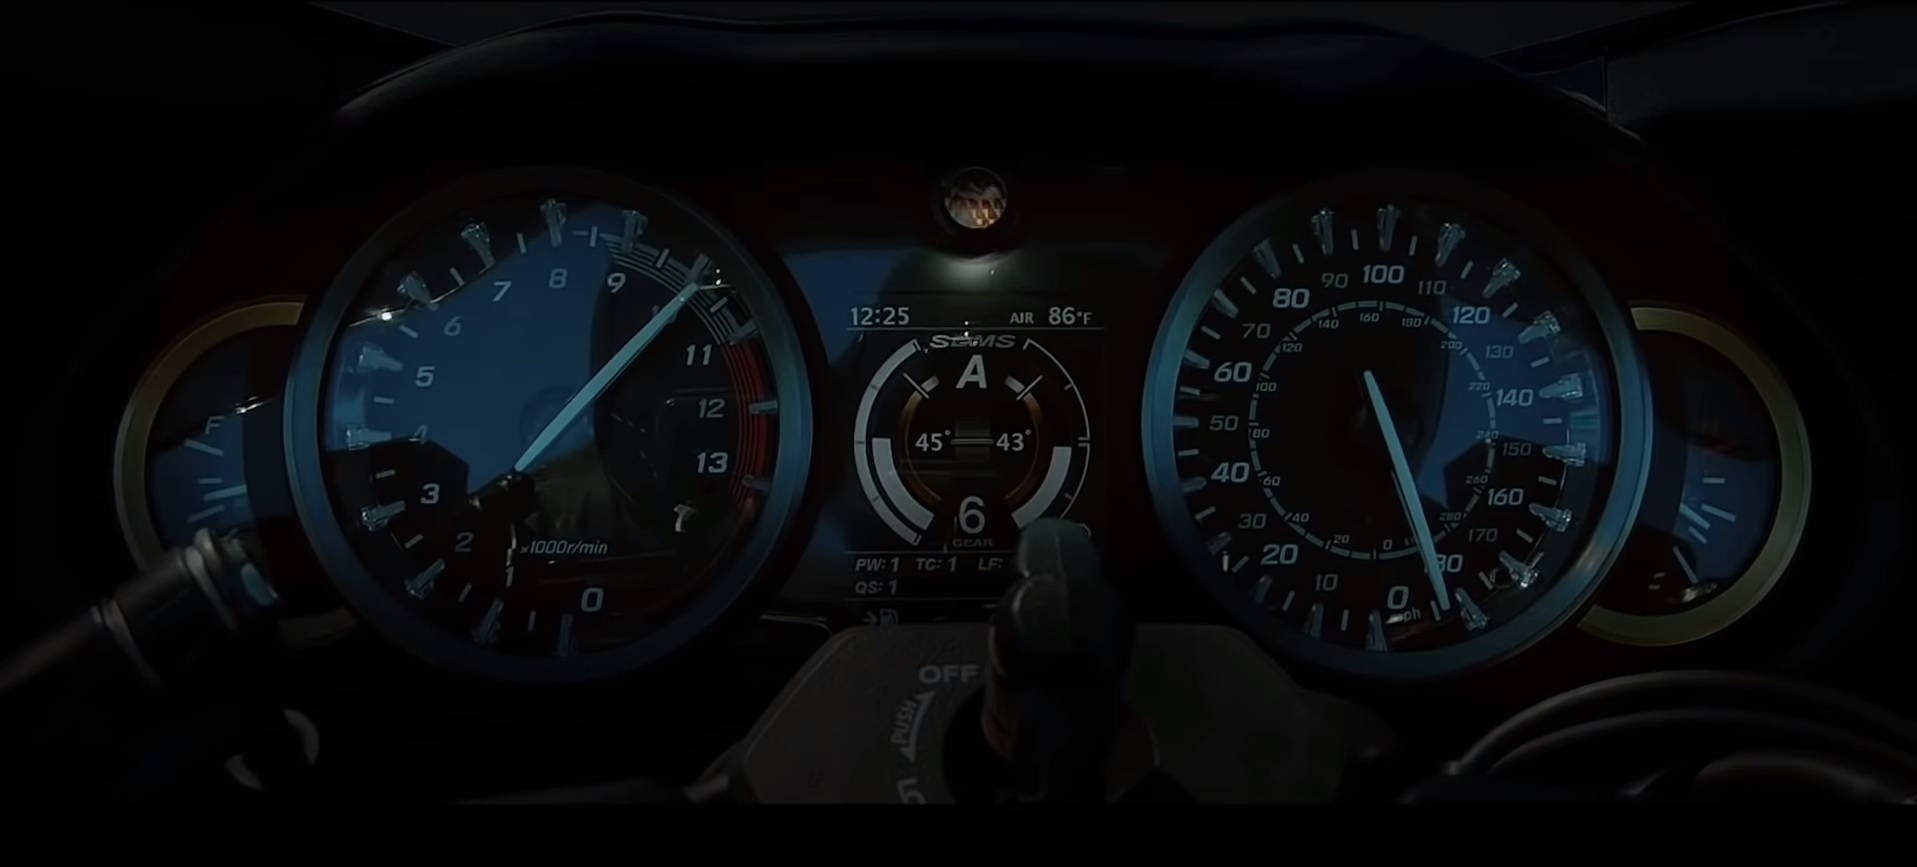 2021 Suzuki Hayabusa Teaser